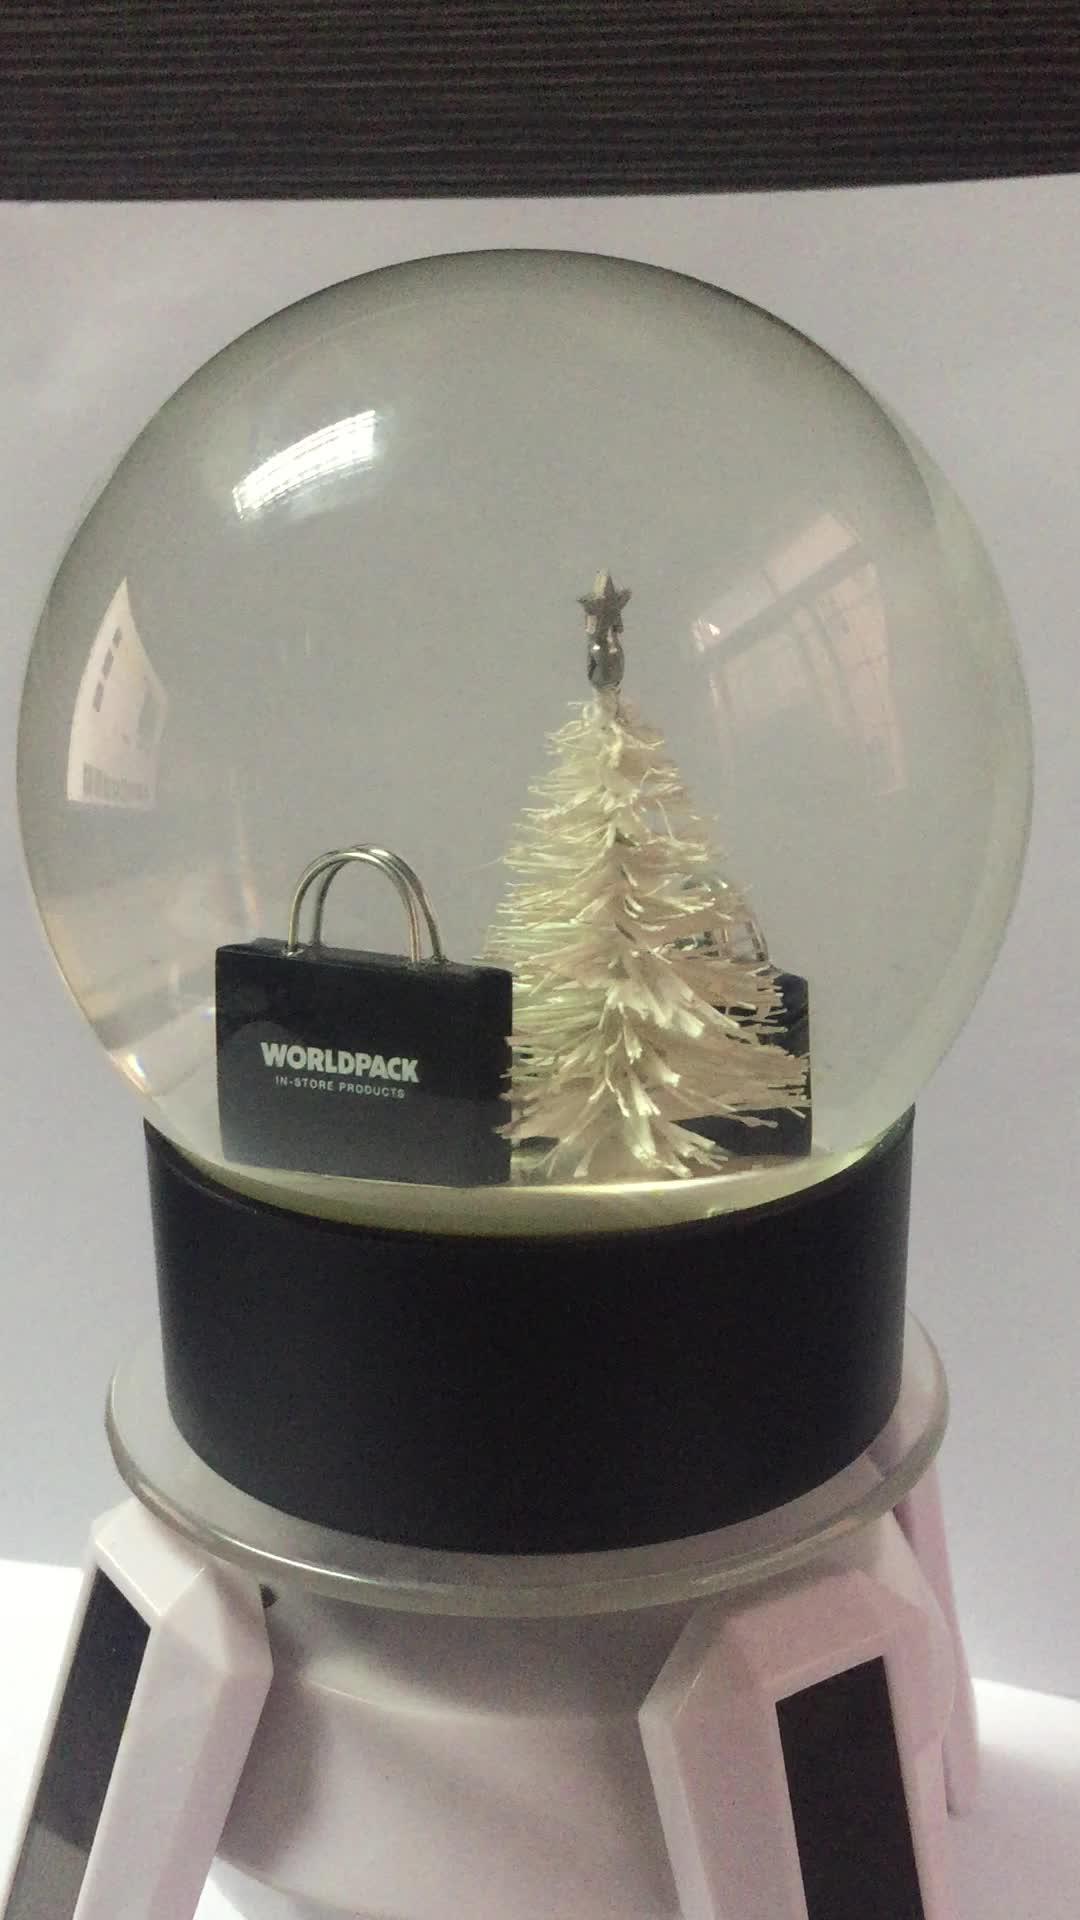 Factory custom glass souvenir snow globe high quality resin material 3D interior glass snow globe